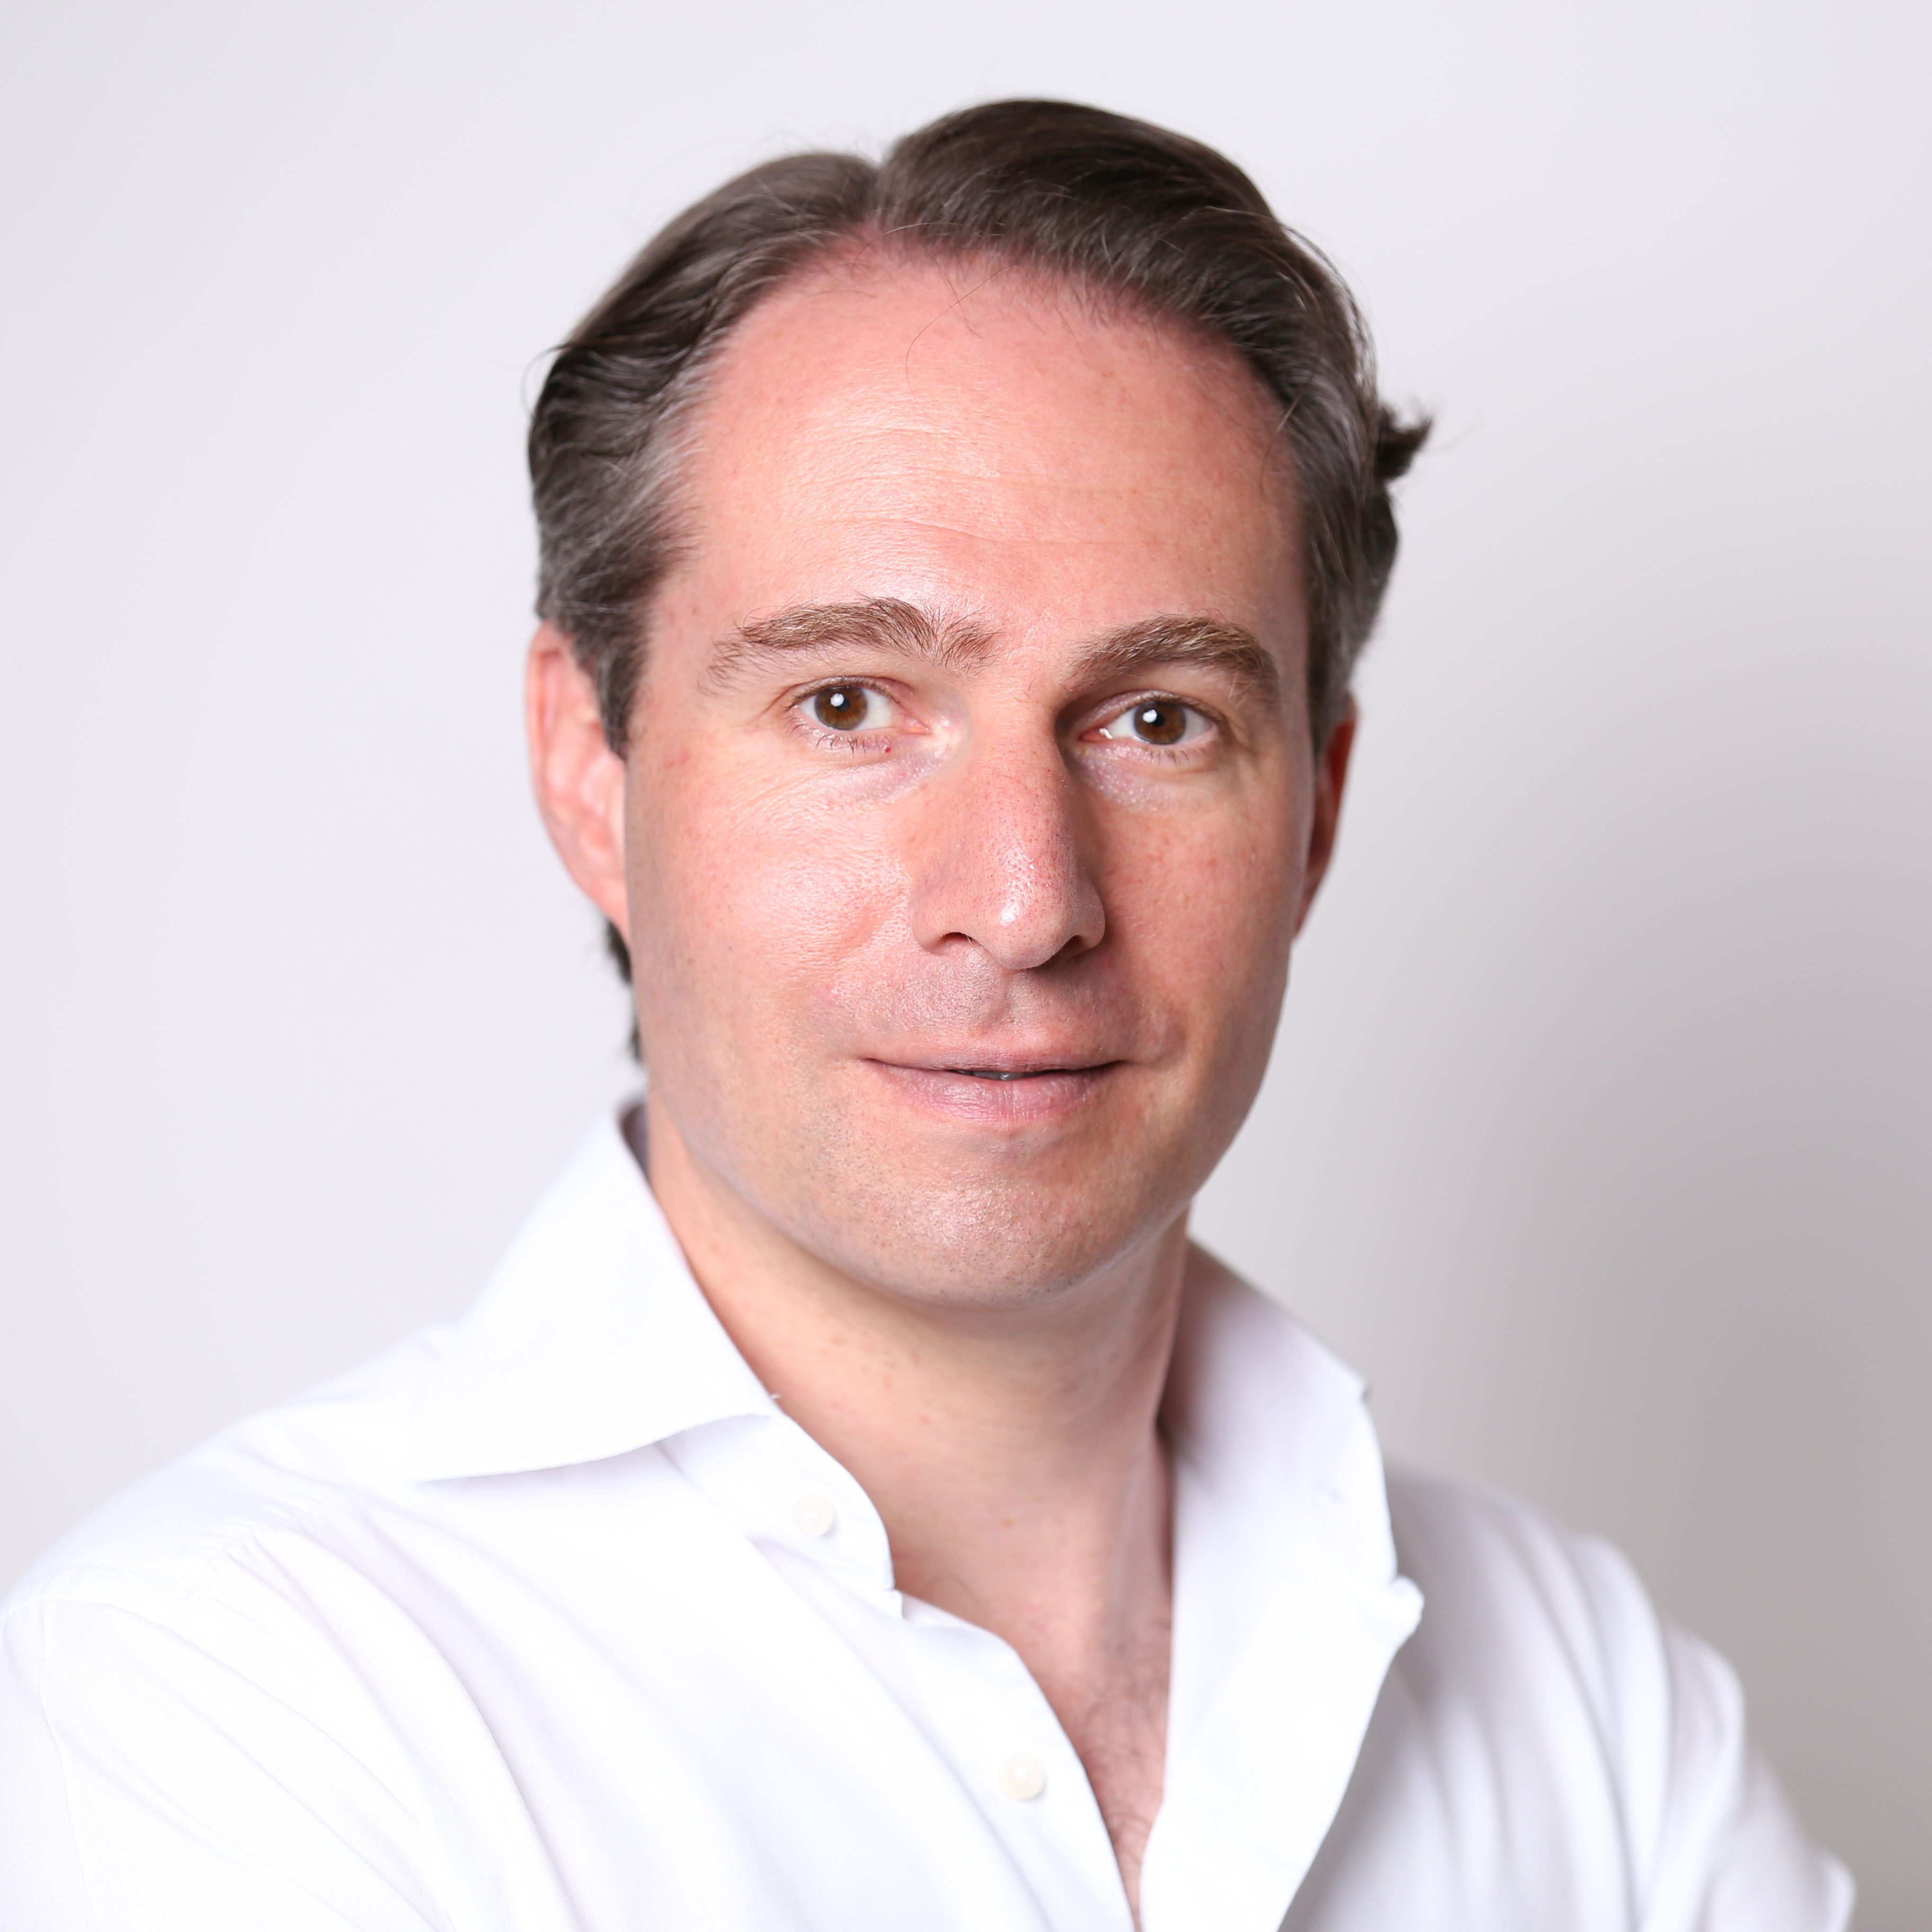 Ihr Kanban System Design Trainer Dr. York Rössler